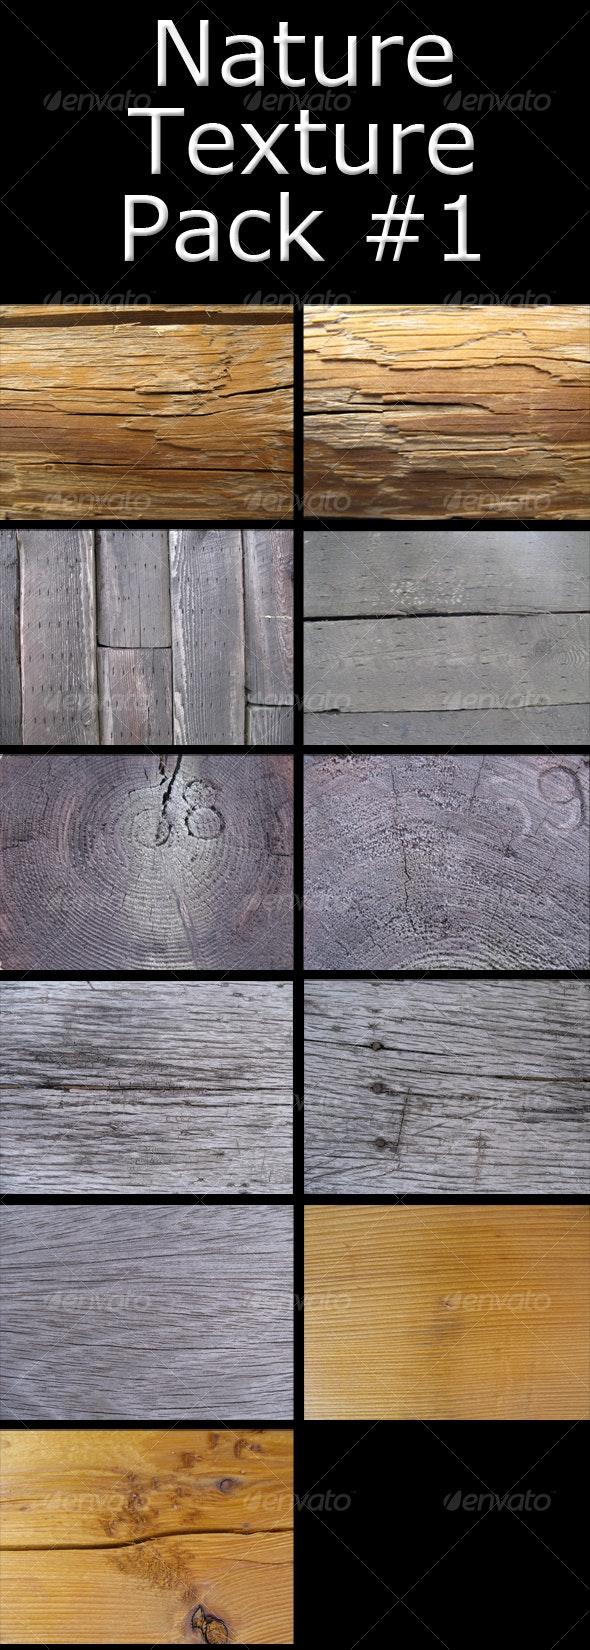 Assortment of 11 Wood Textures - Wood Textures